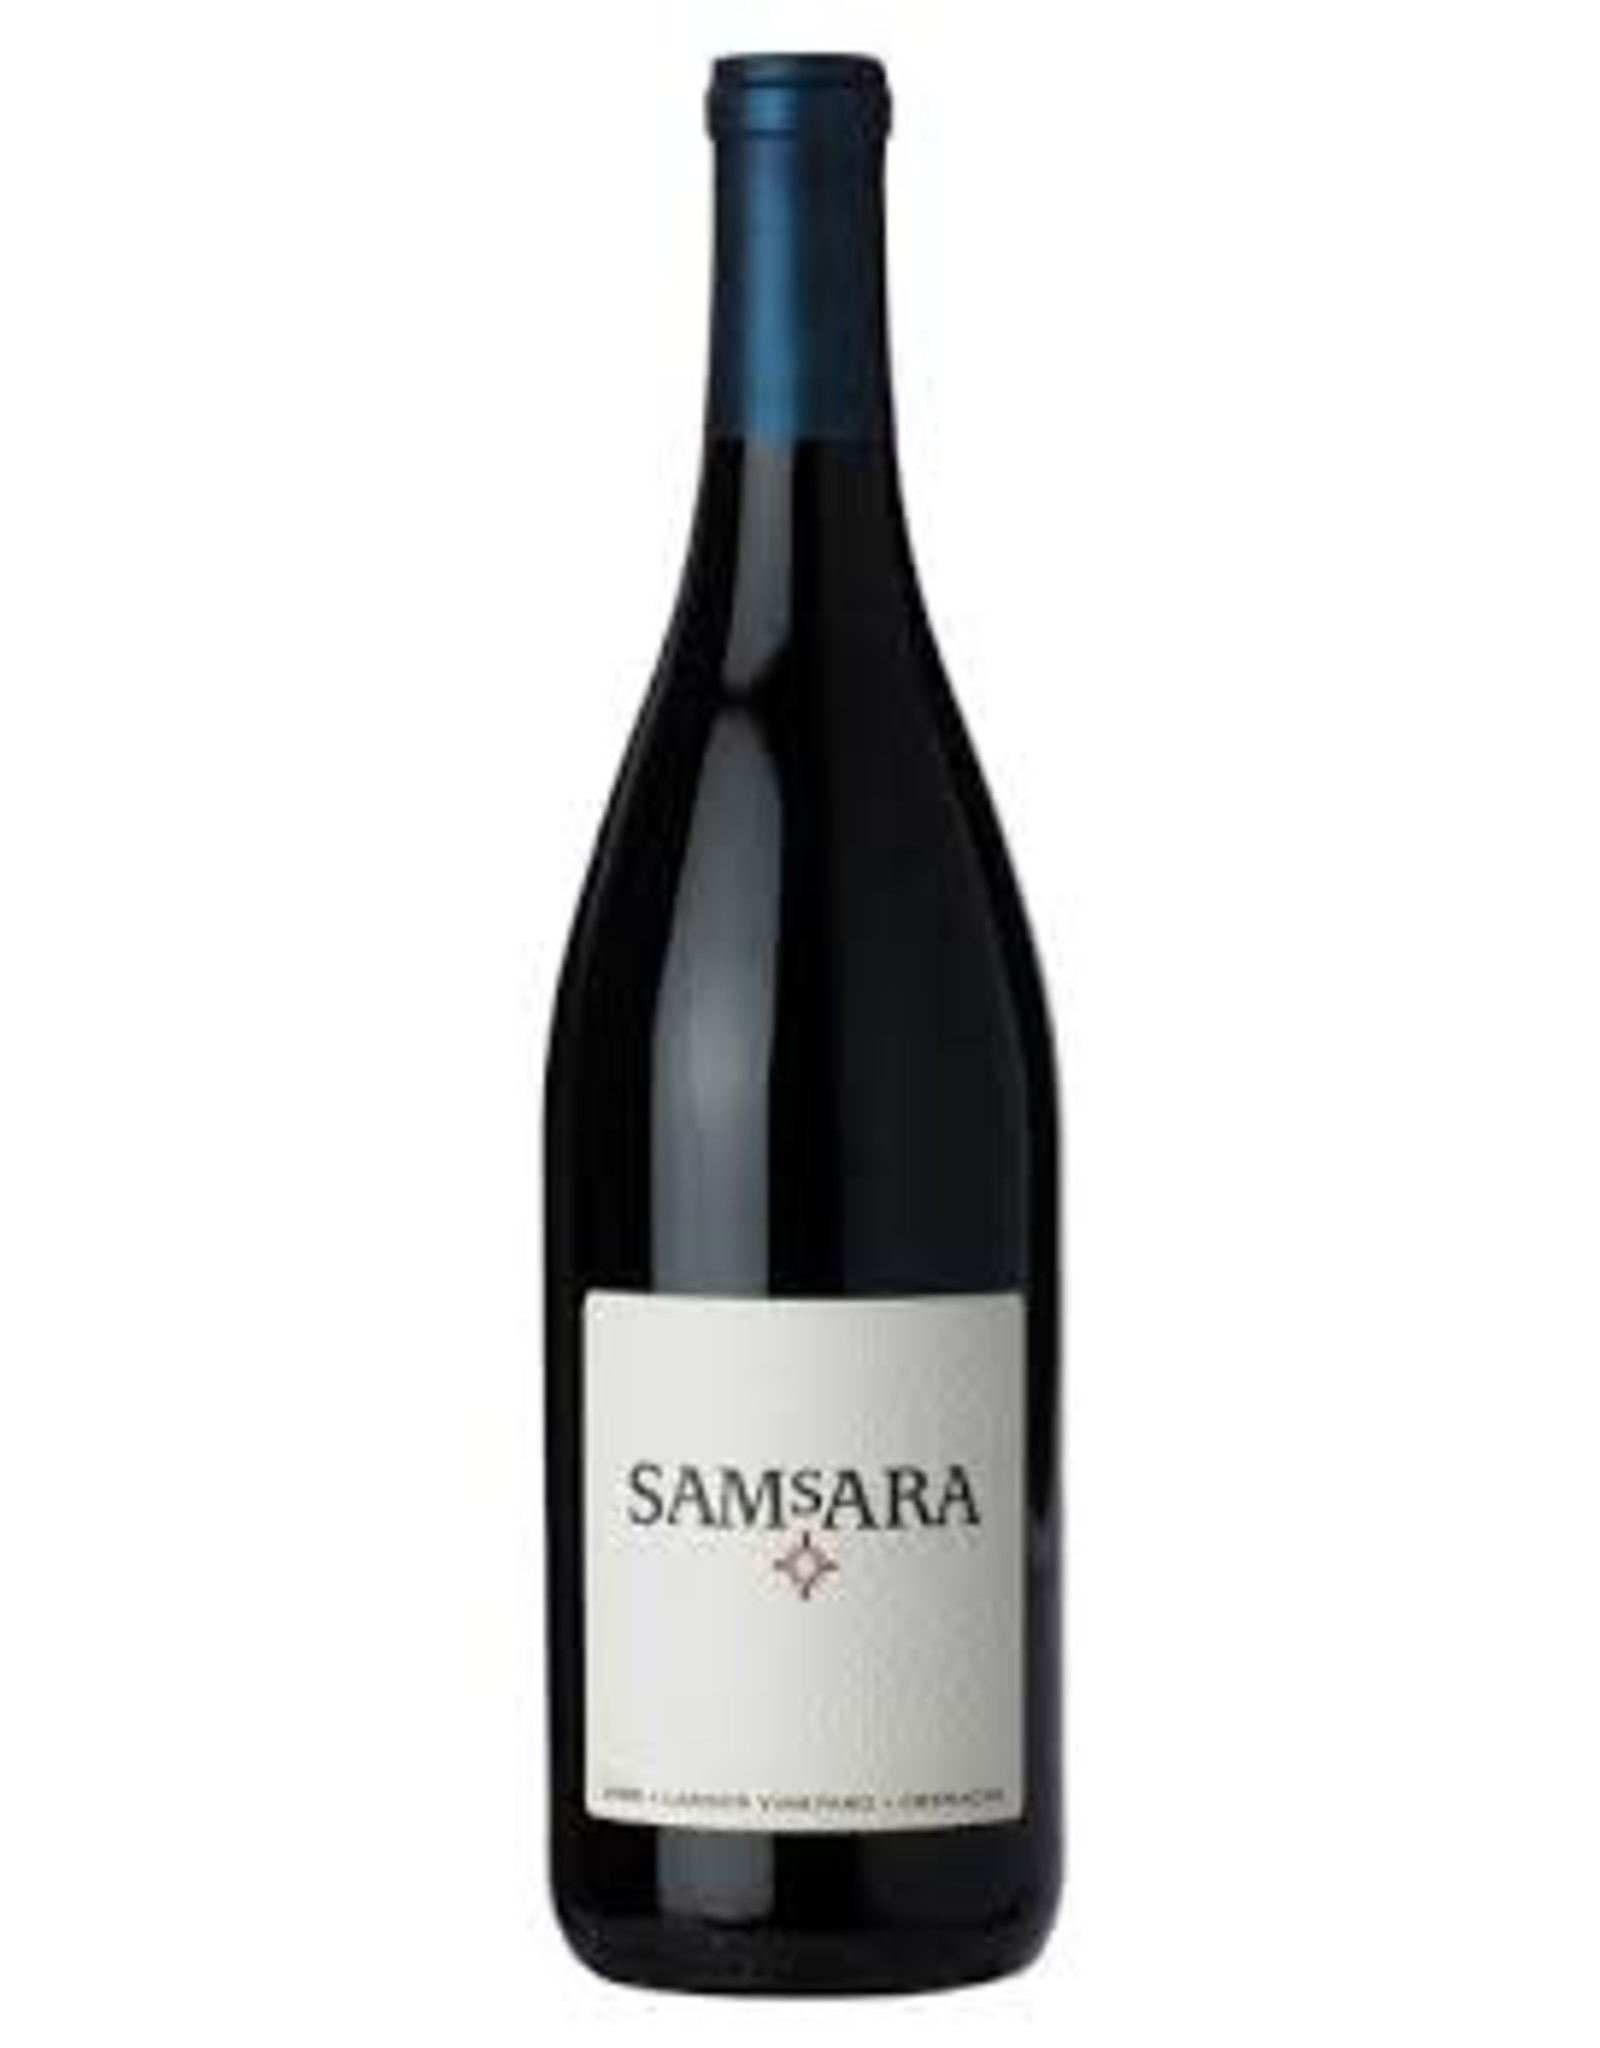 Samsara Grenache 2010